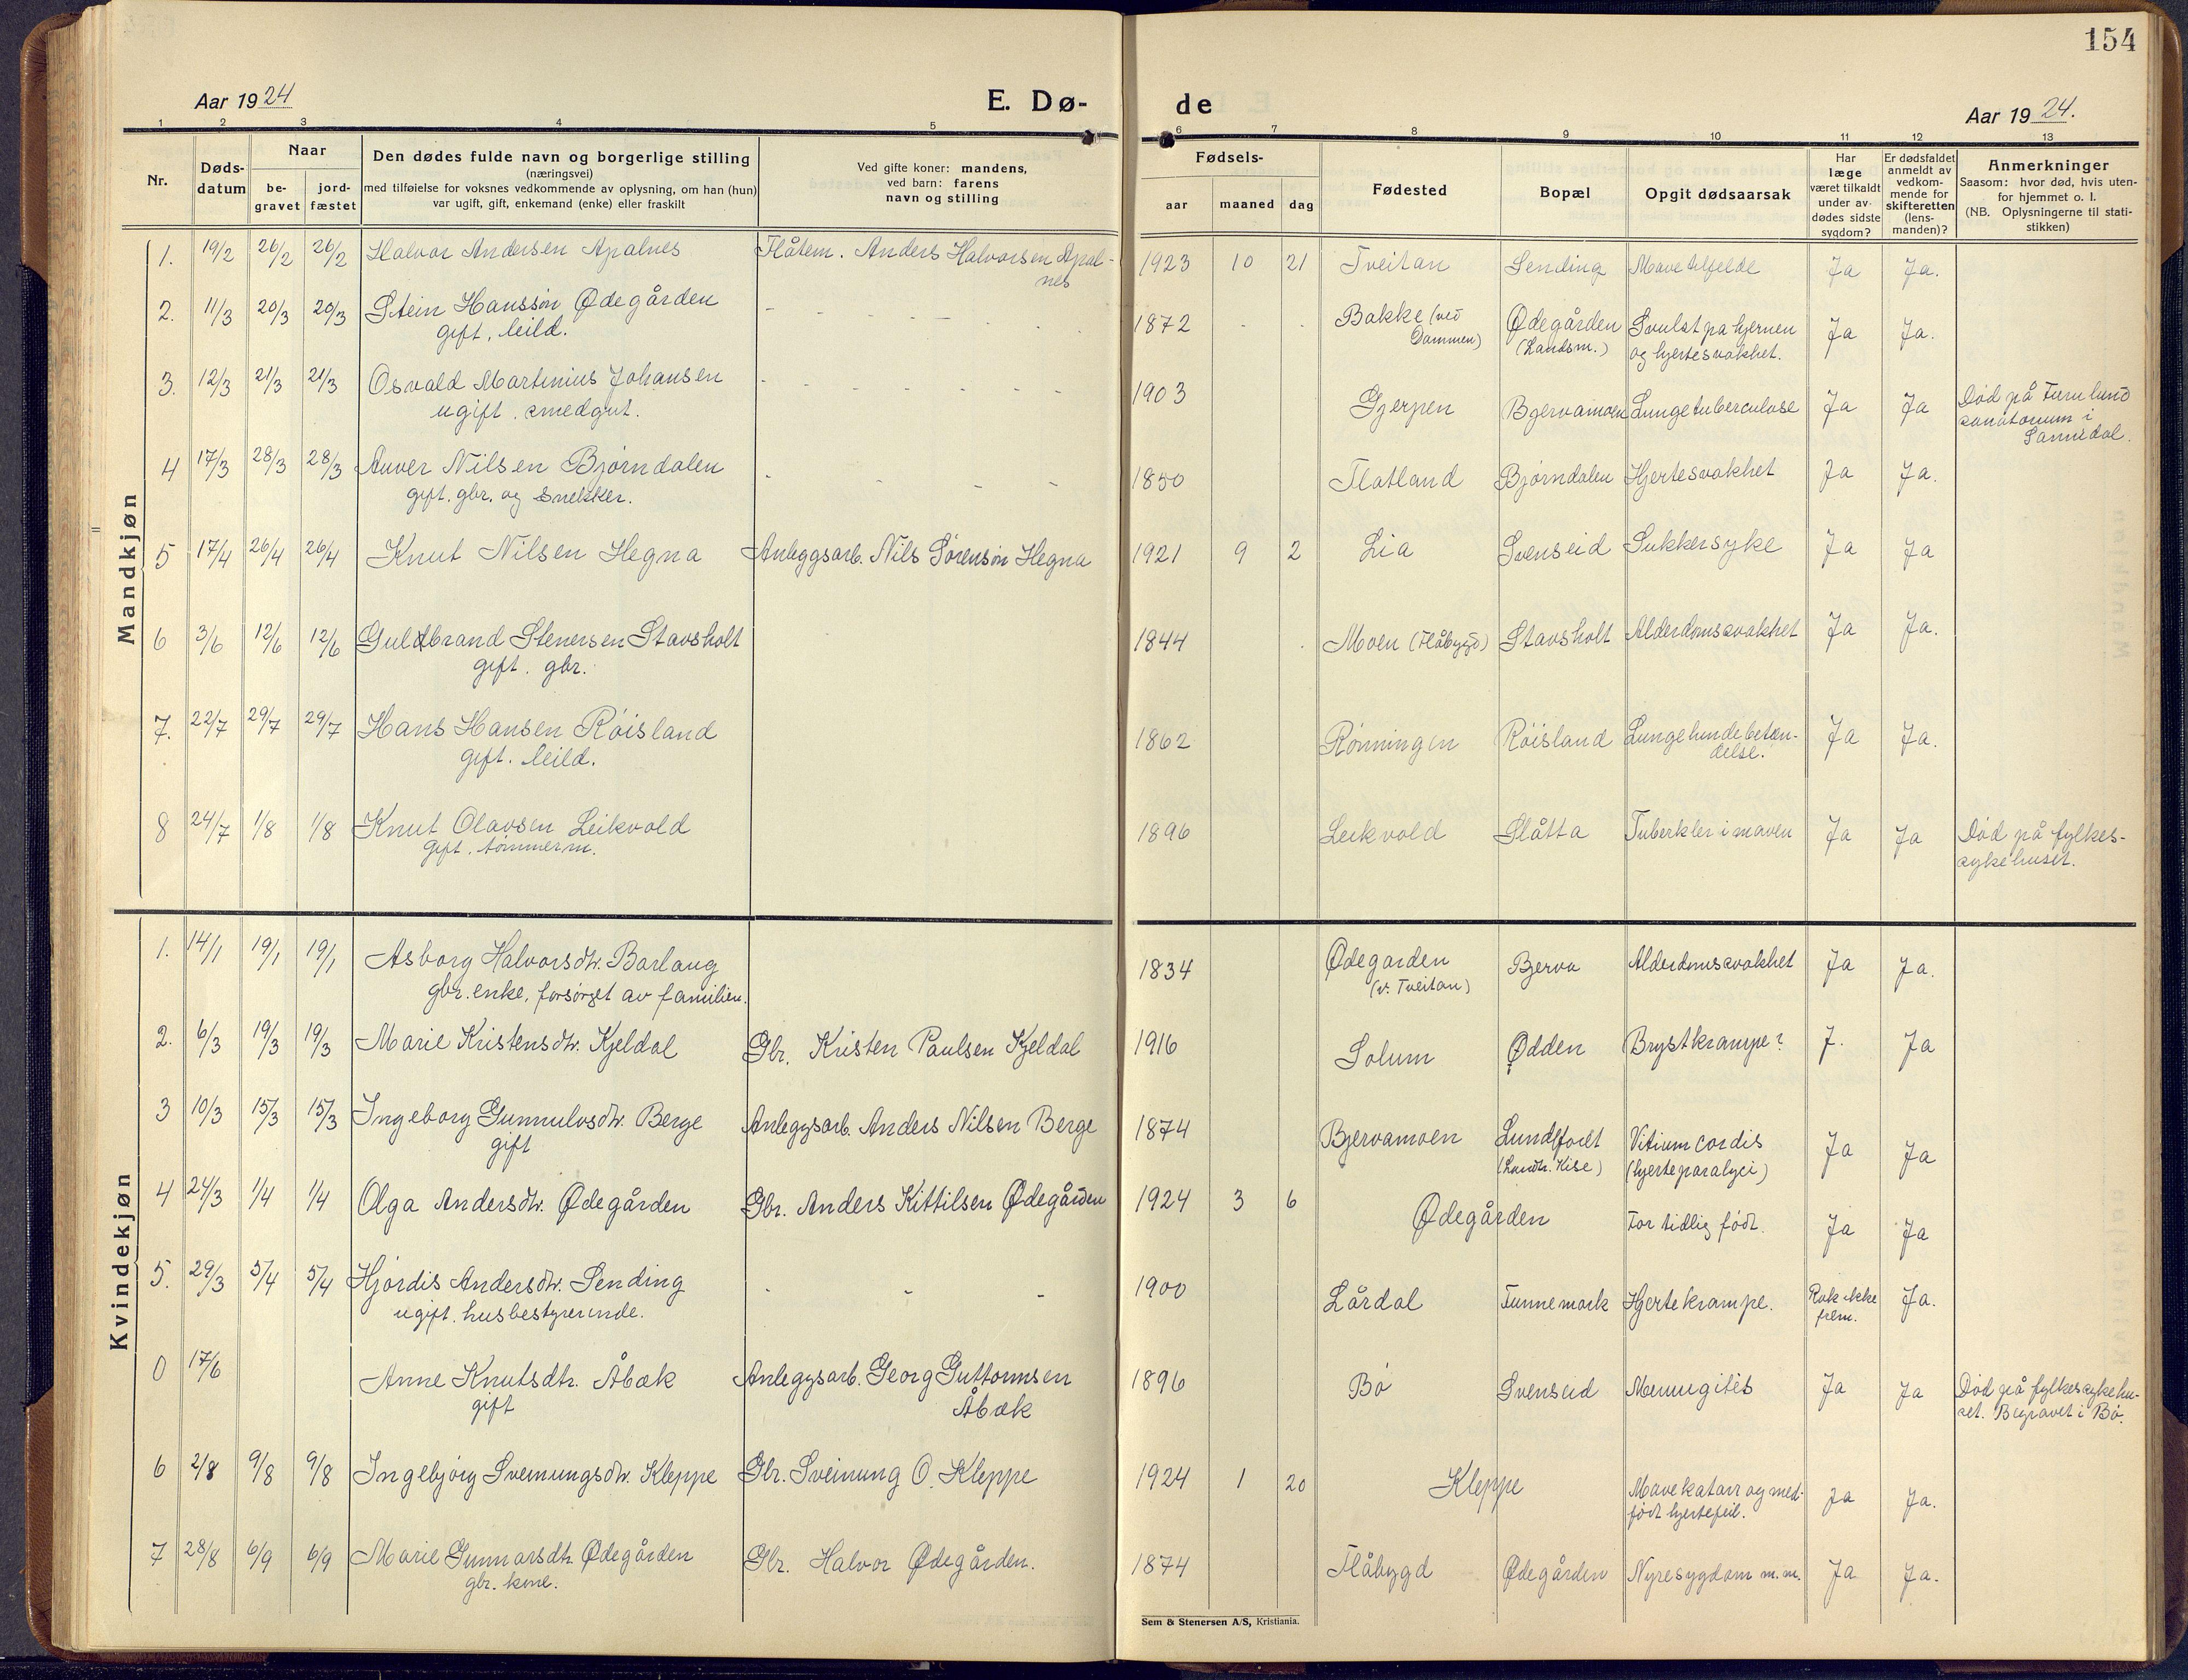 SAKO, Lunde kirkebøker, F/Fa/L0006: Ministerialbok nr. I 6, 1922-1940, s. 154